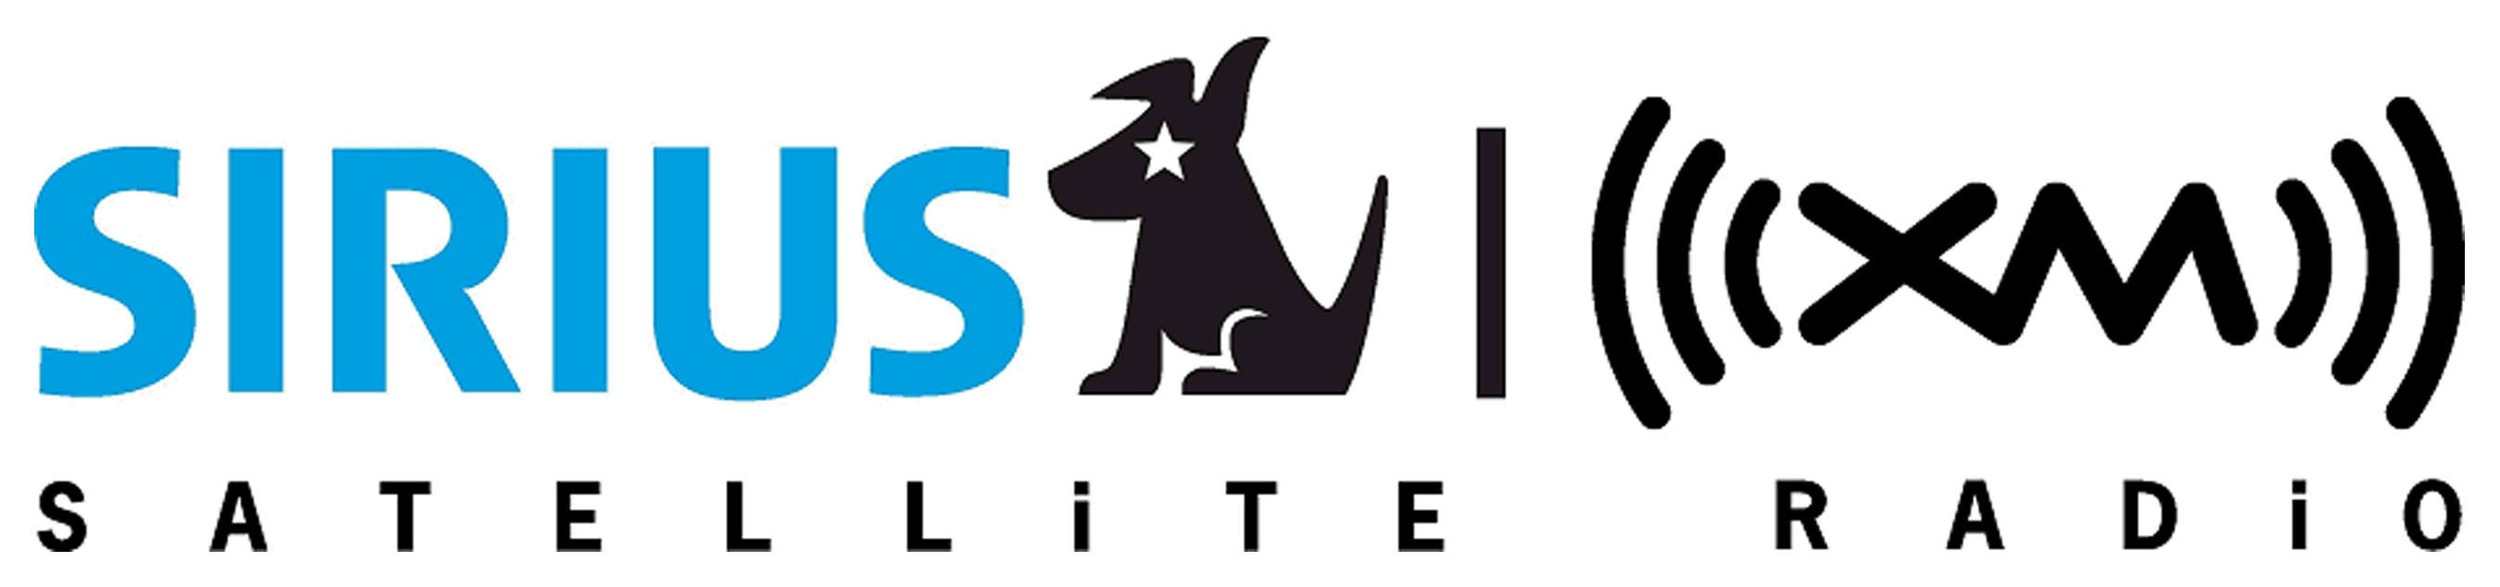 sirius-xm-radio-logo.jpg